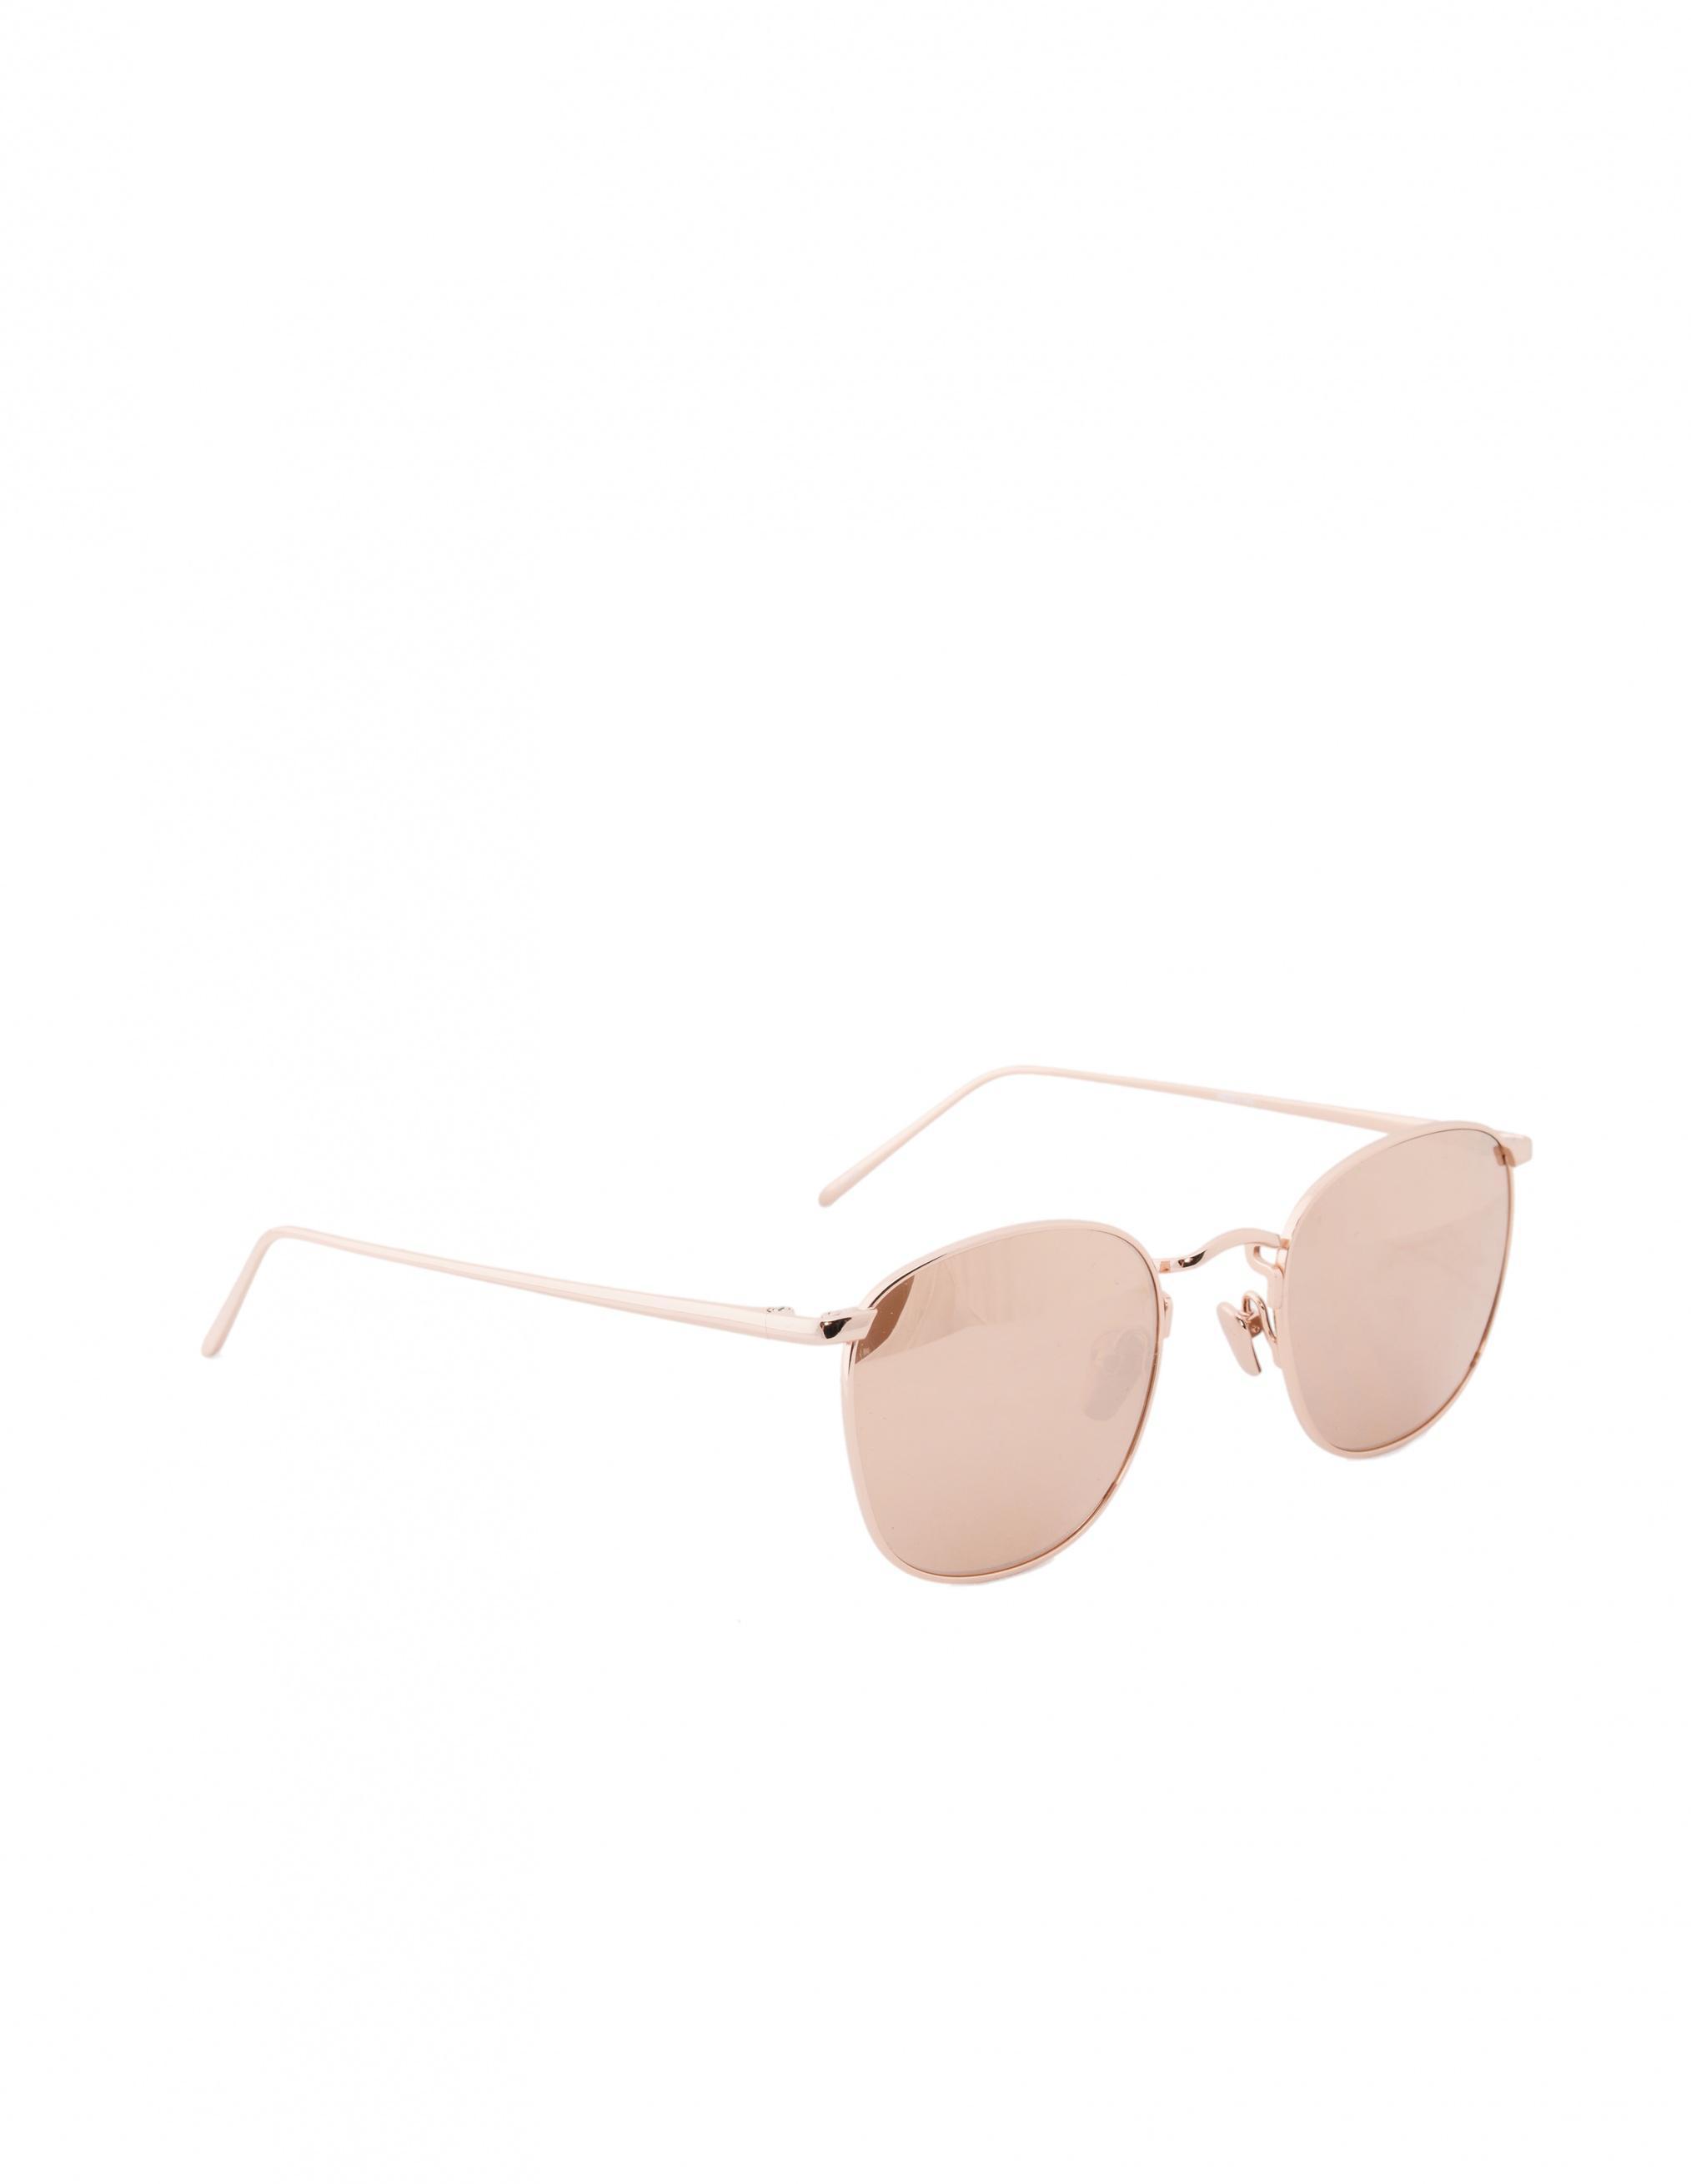 a52f4e38478 Lyst - Linda Farrow Luxe Sunglasses - Save 30.687830687830683%